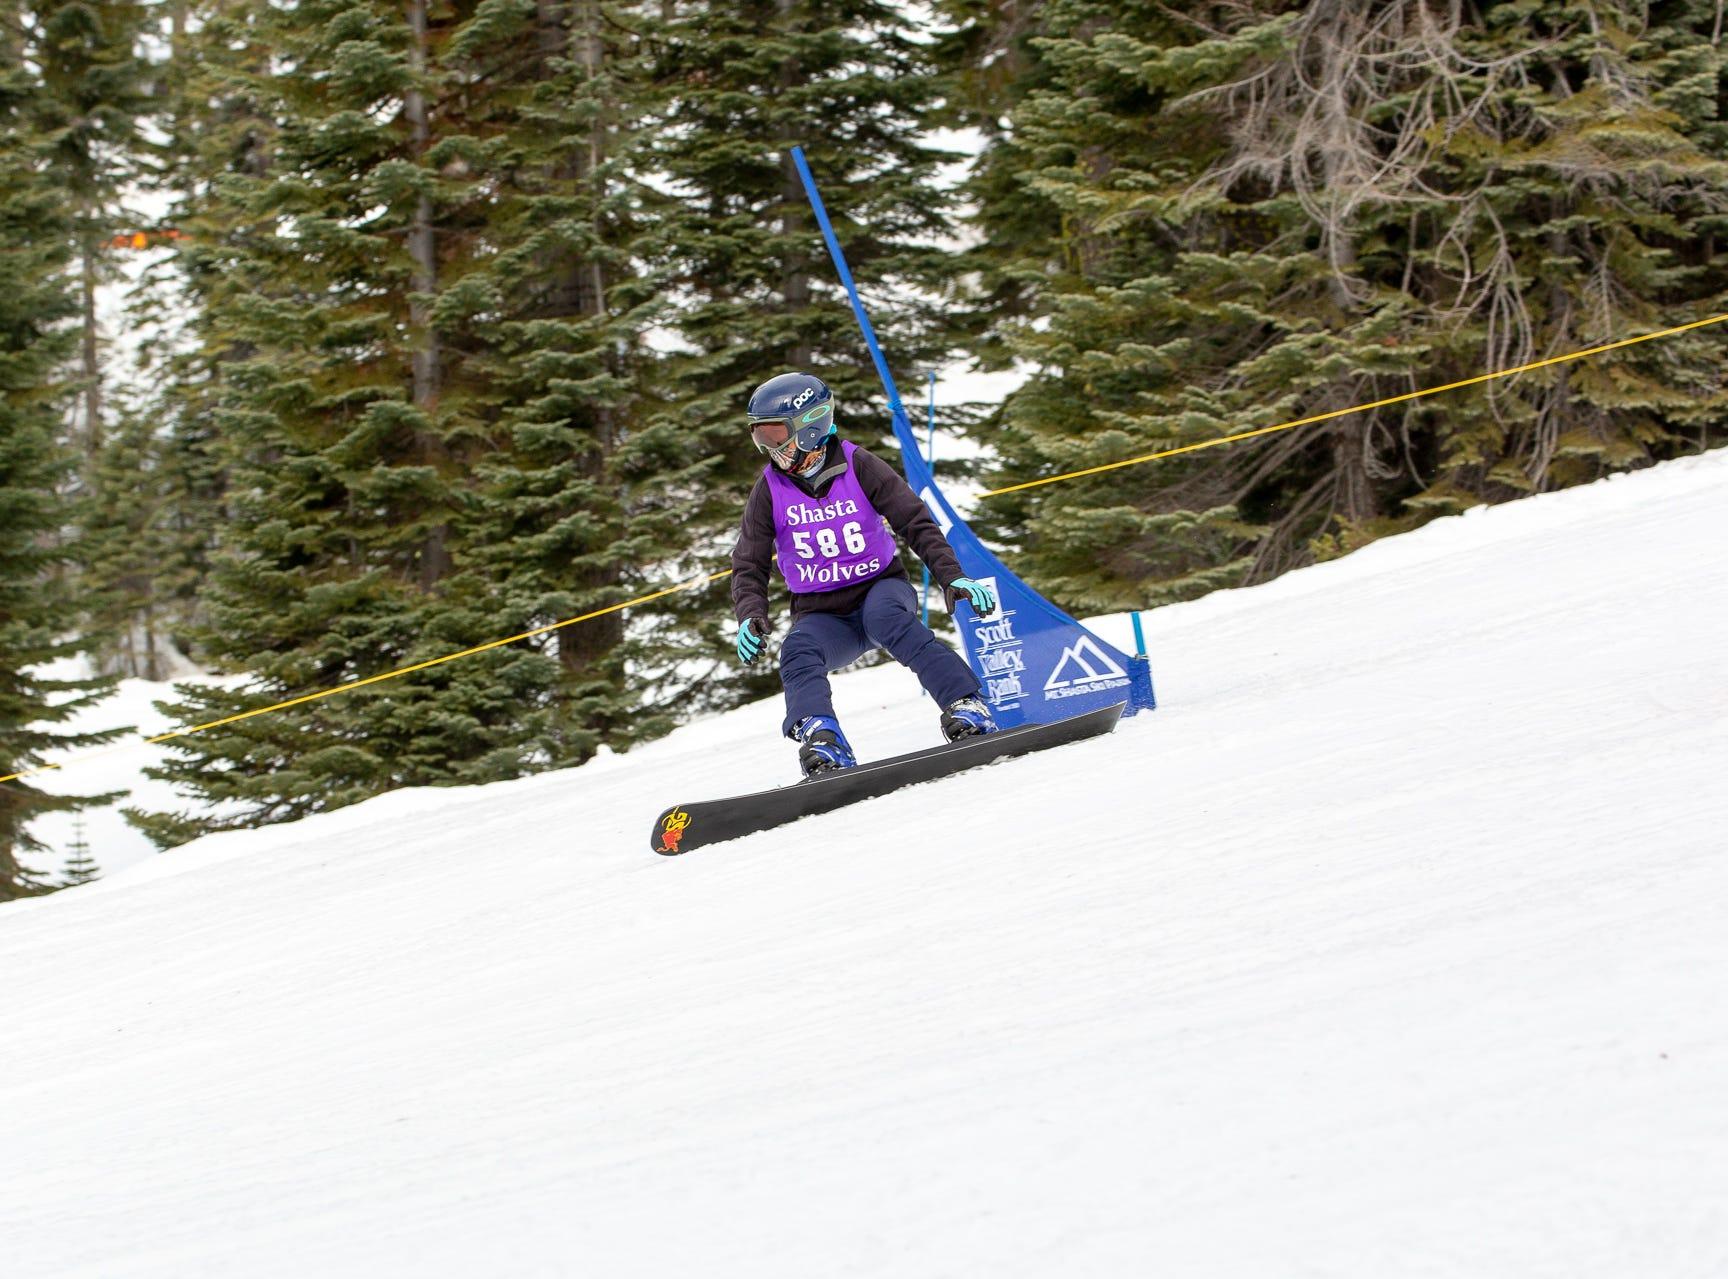 Sage Will of Shasta High races in the third high school snowboard meet of 2019 on Monday, Jan. 28 at Mt. Shasta Ski Park.